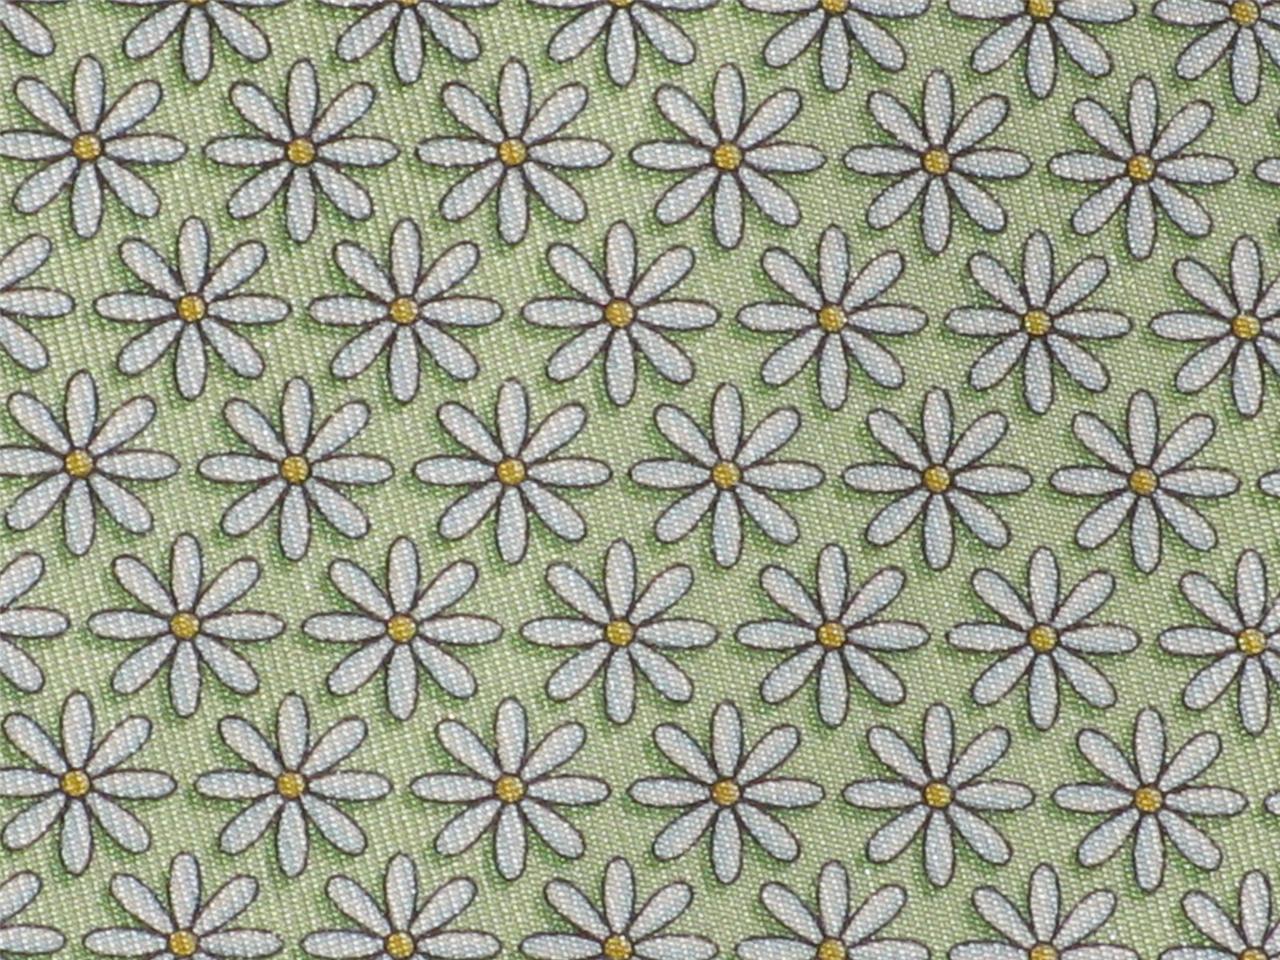 Vineyard-Vines-Daisy-Flower-Spring-Plant-SILK-Neck-Tie-NWOT-75-Many    Vineyard Vines Fish Pattern